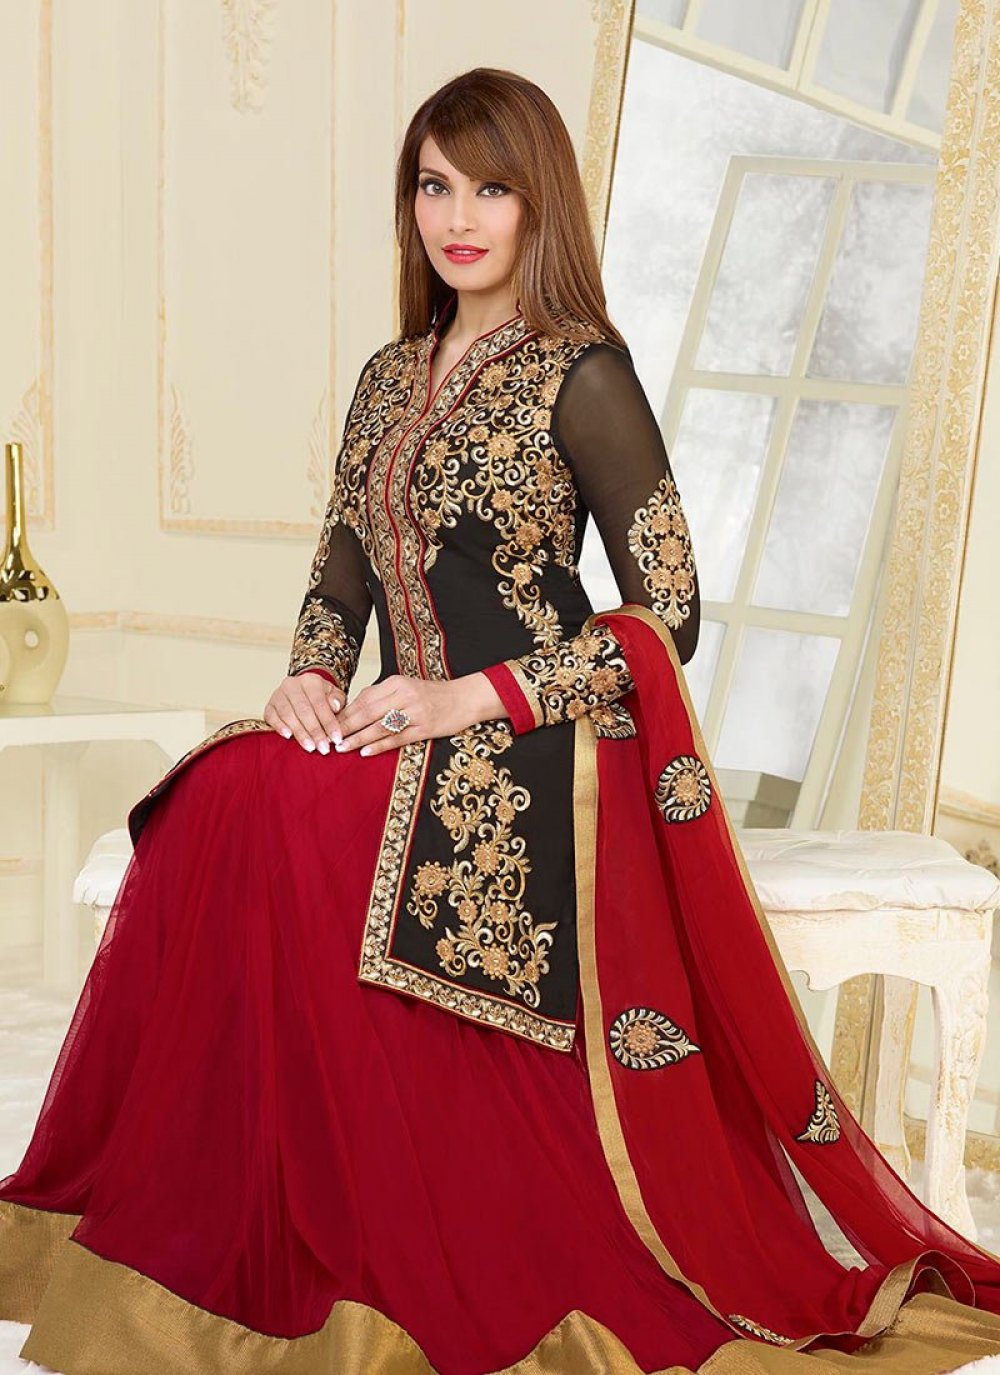 Bipasha Basu Black And Maroon Resham Work Length Anarkali Suit